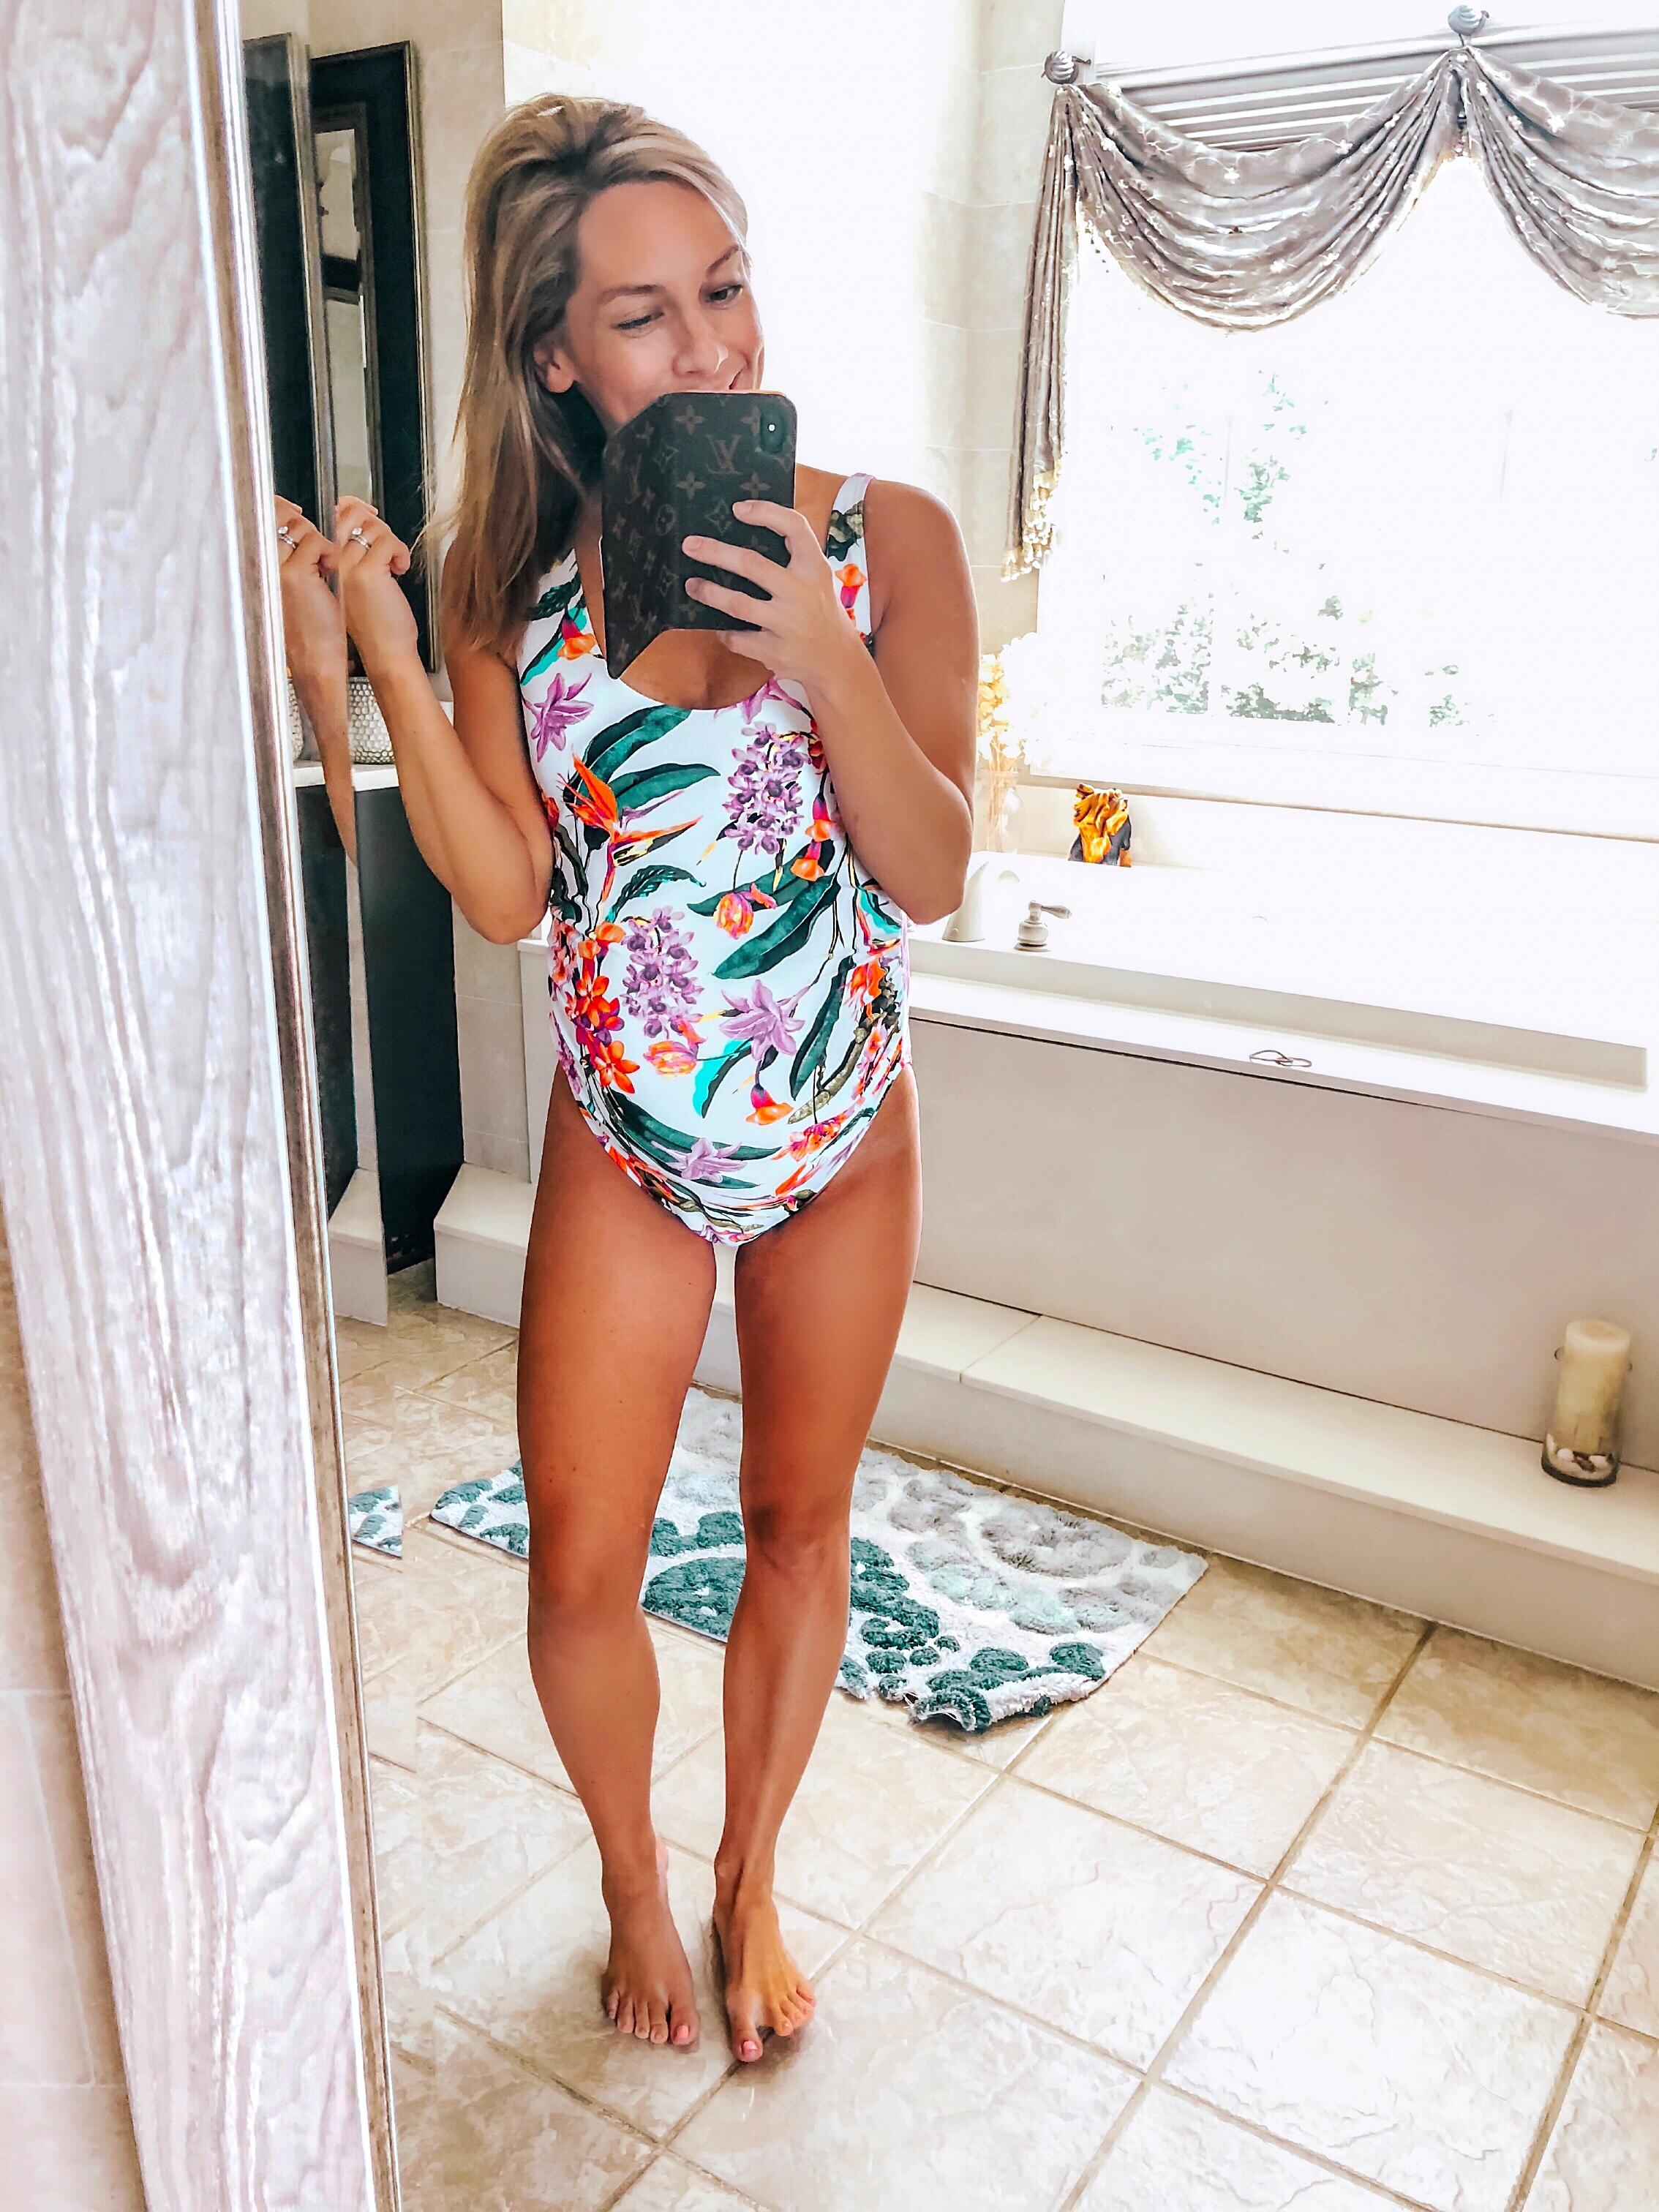 buy best utterly stylish cozy fresh Cute & Flattering Maternity Swimsuits! & a 37 Week Bumpdate ...